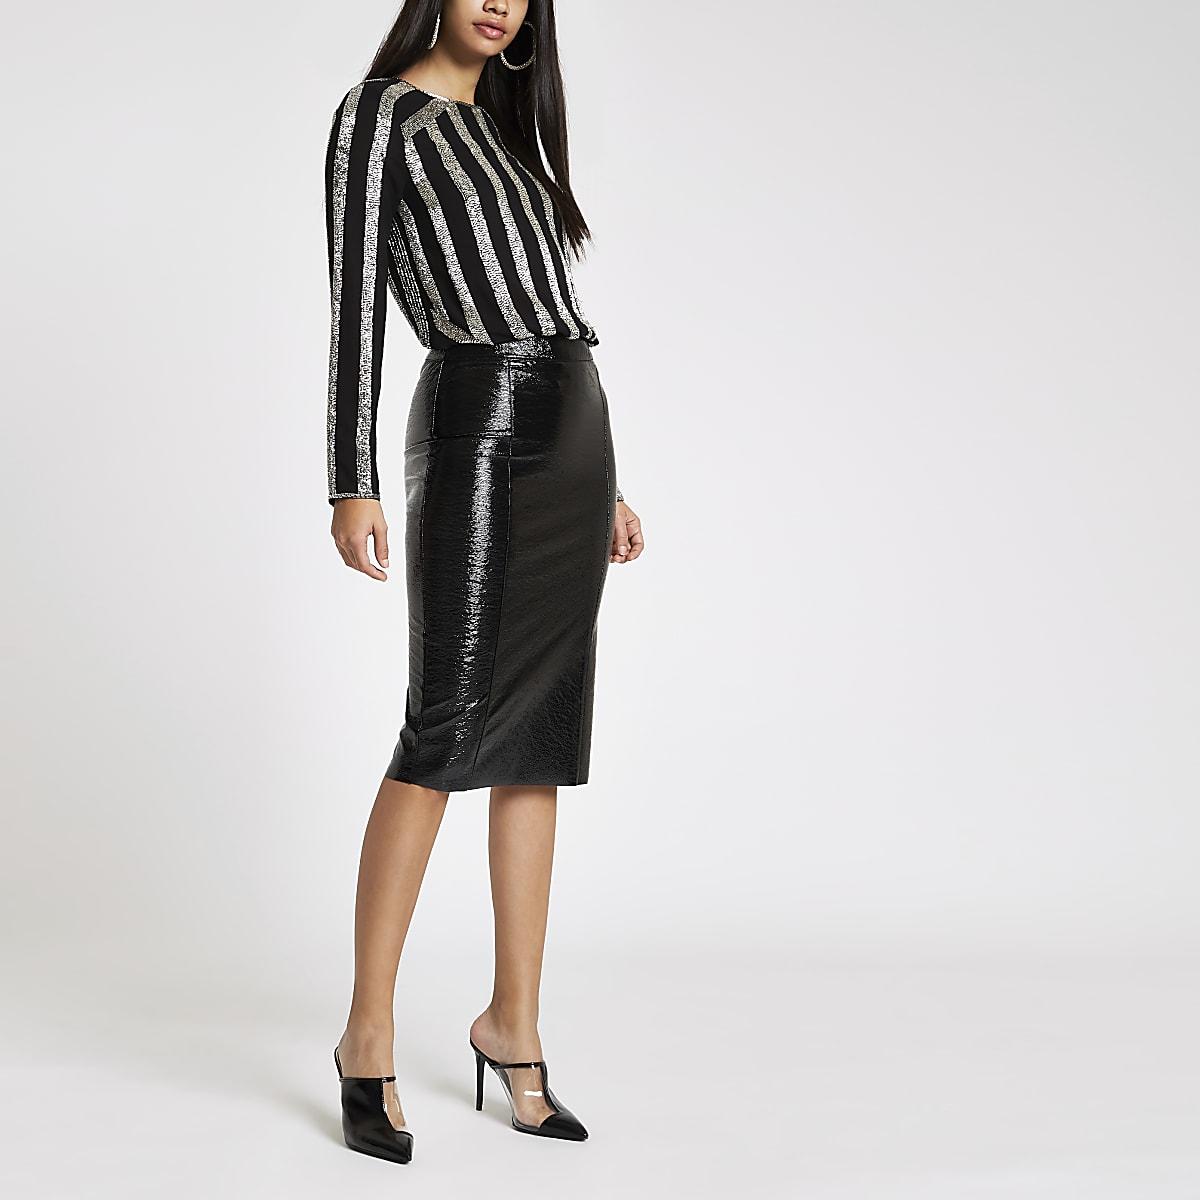 Black vinyl pencil skirt